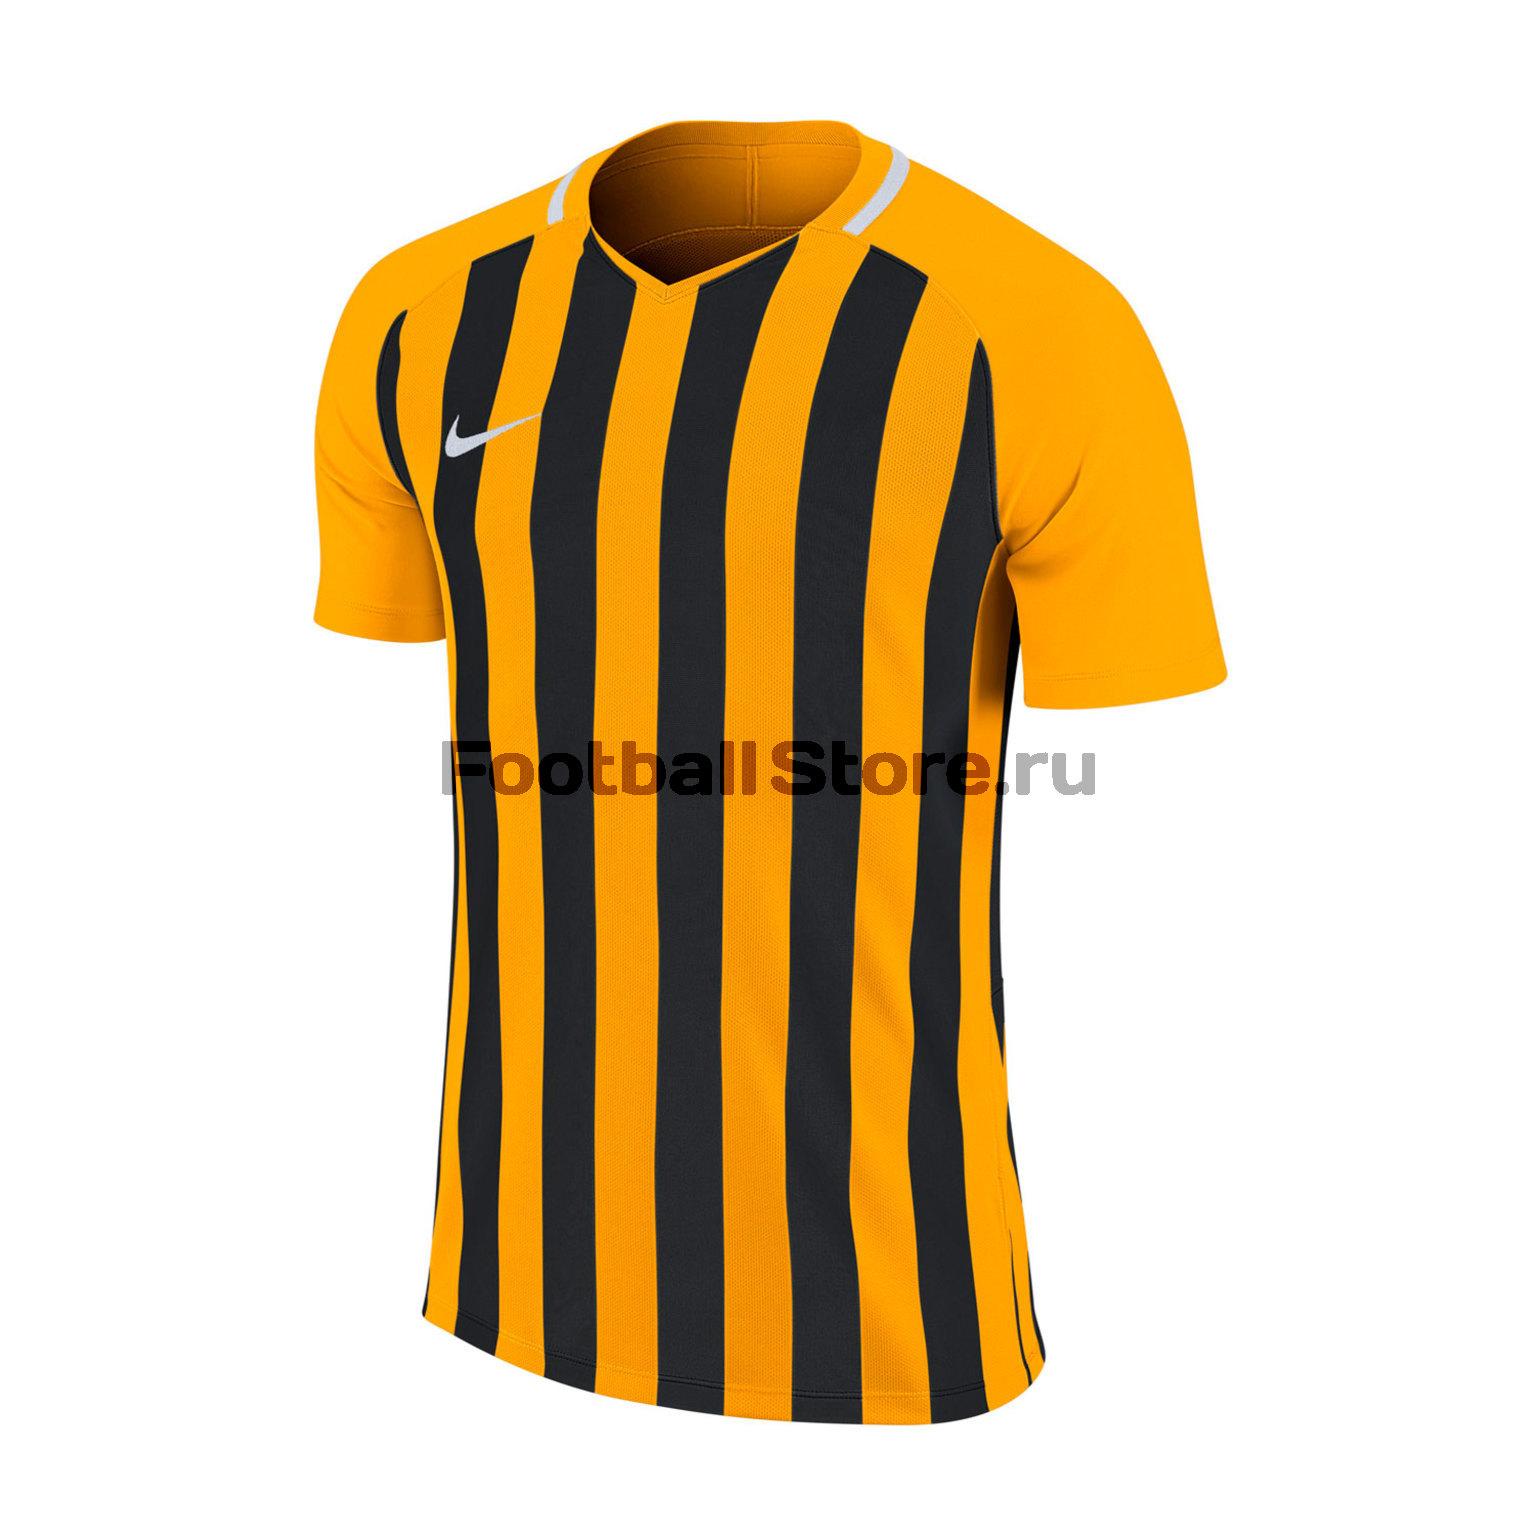 Футболка подростковая Футболка Nike SS Striped Division JSY 894102-739 striped longline tshirt